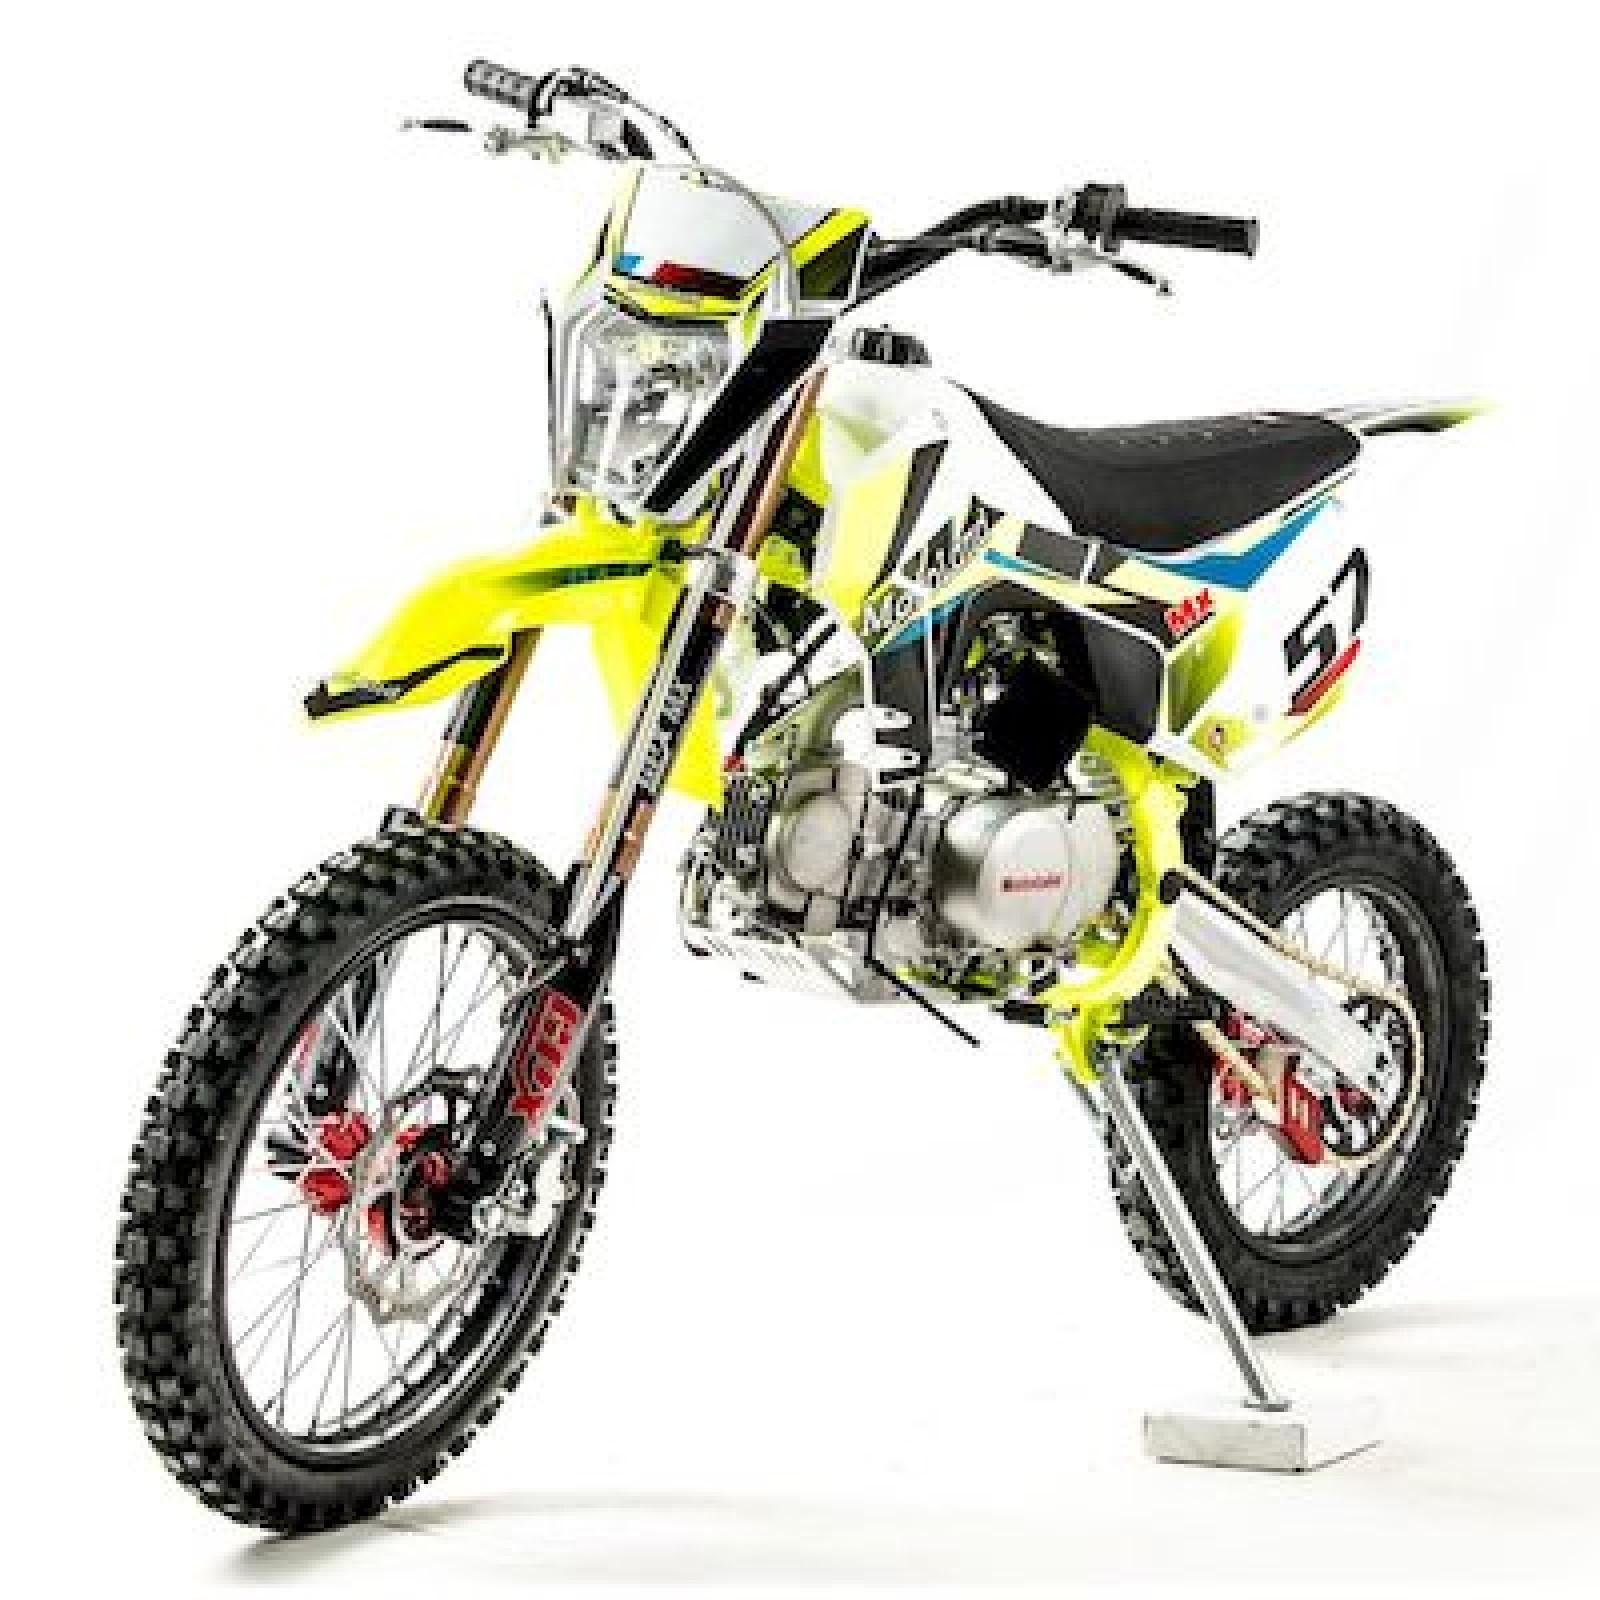 Питбайк MotoLand MX125 KKE (2020)